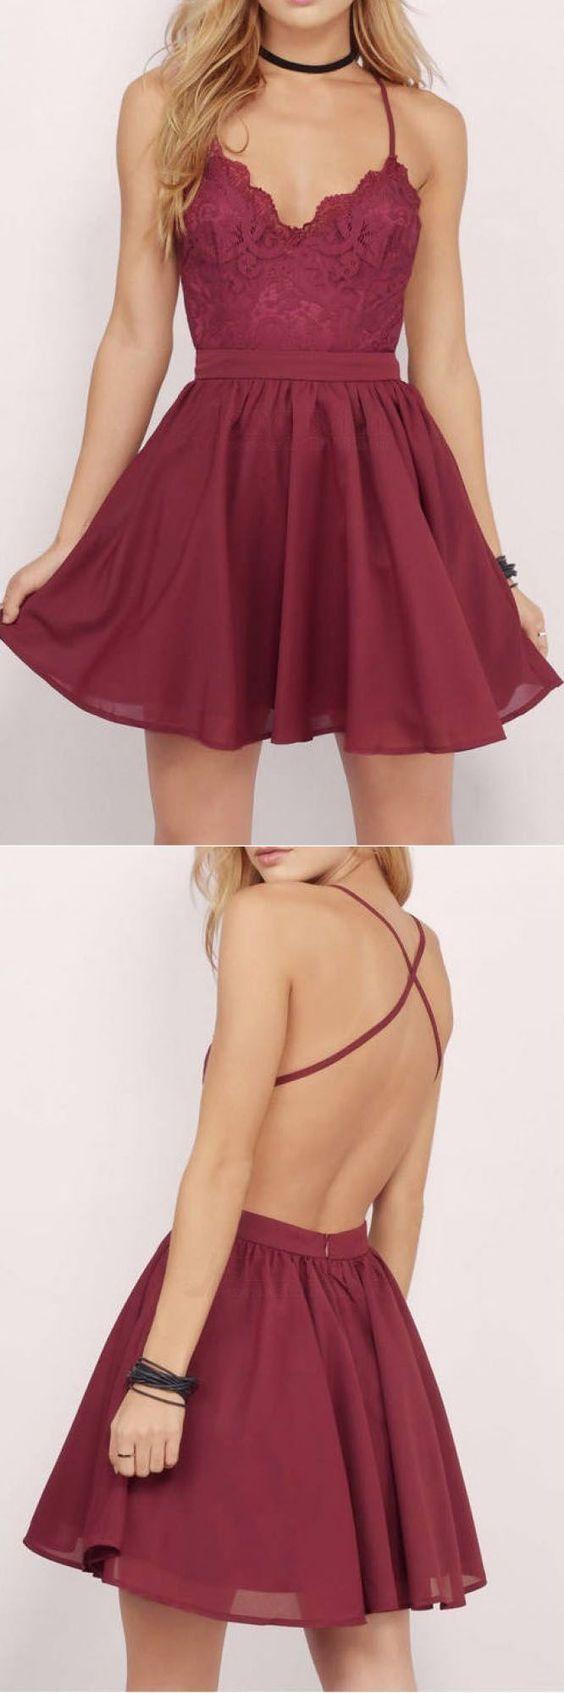 Burgundy Homecoming Dress, Short Homecoming Dress, Lace Homecoming Dress, Chiffon Homecoming Dress 0615